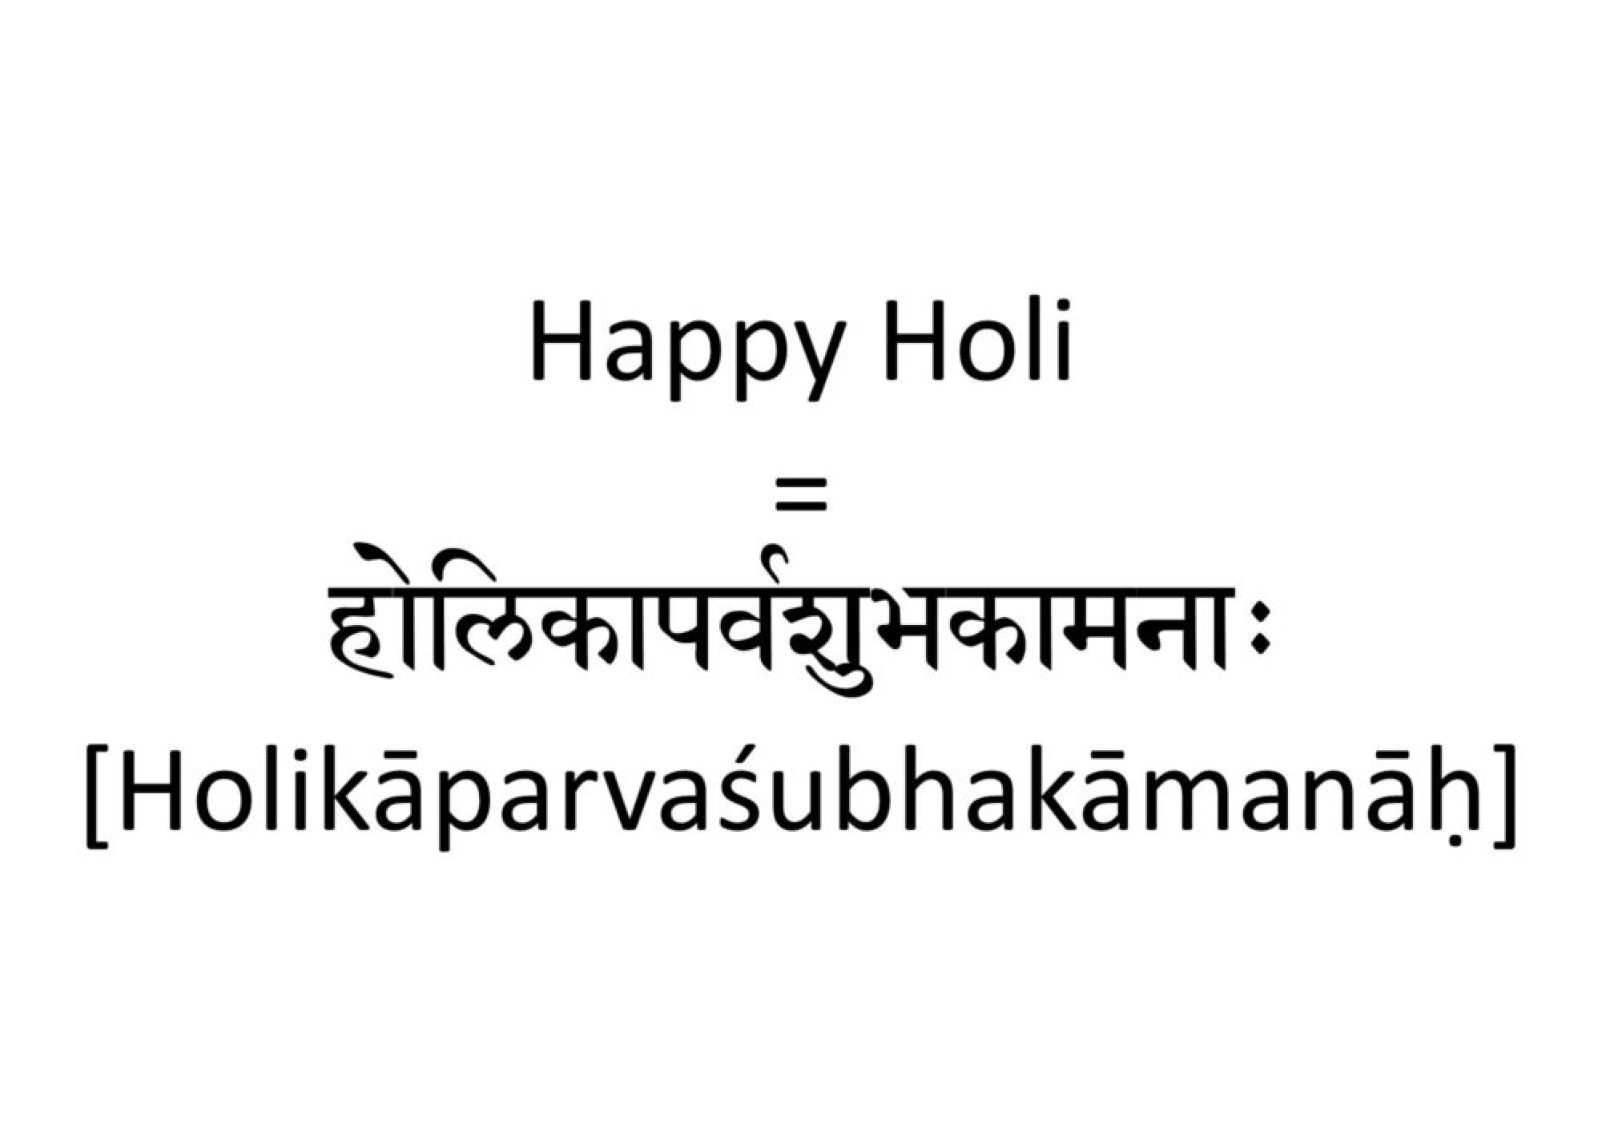 How to Say Happy Holi in Sanskrit